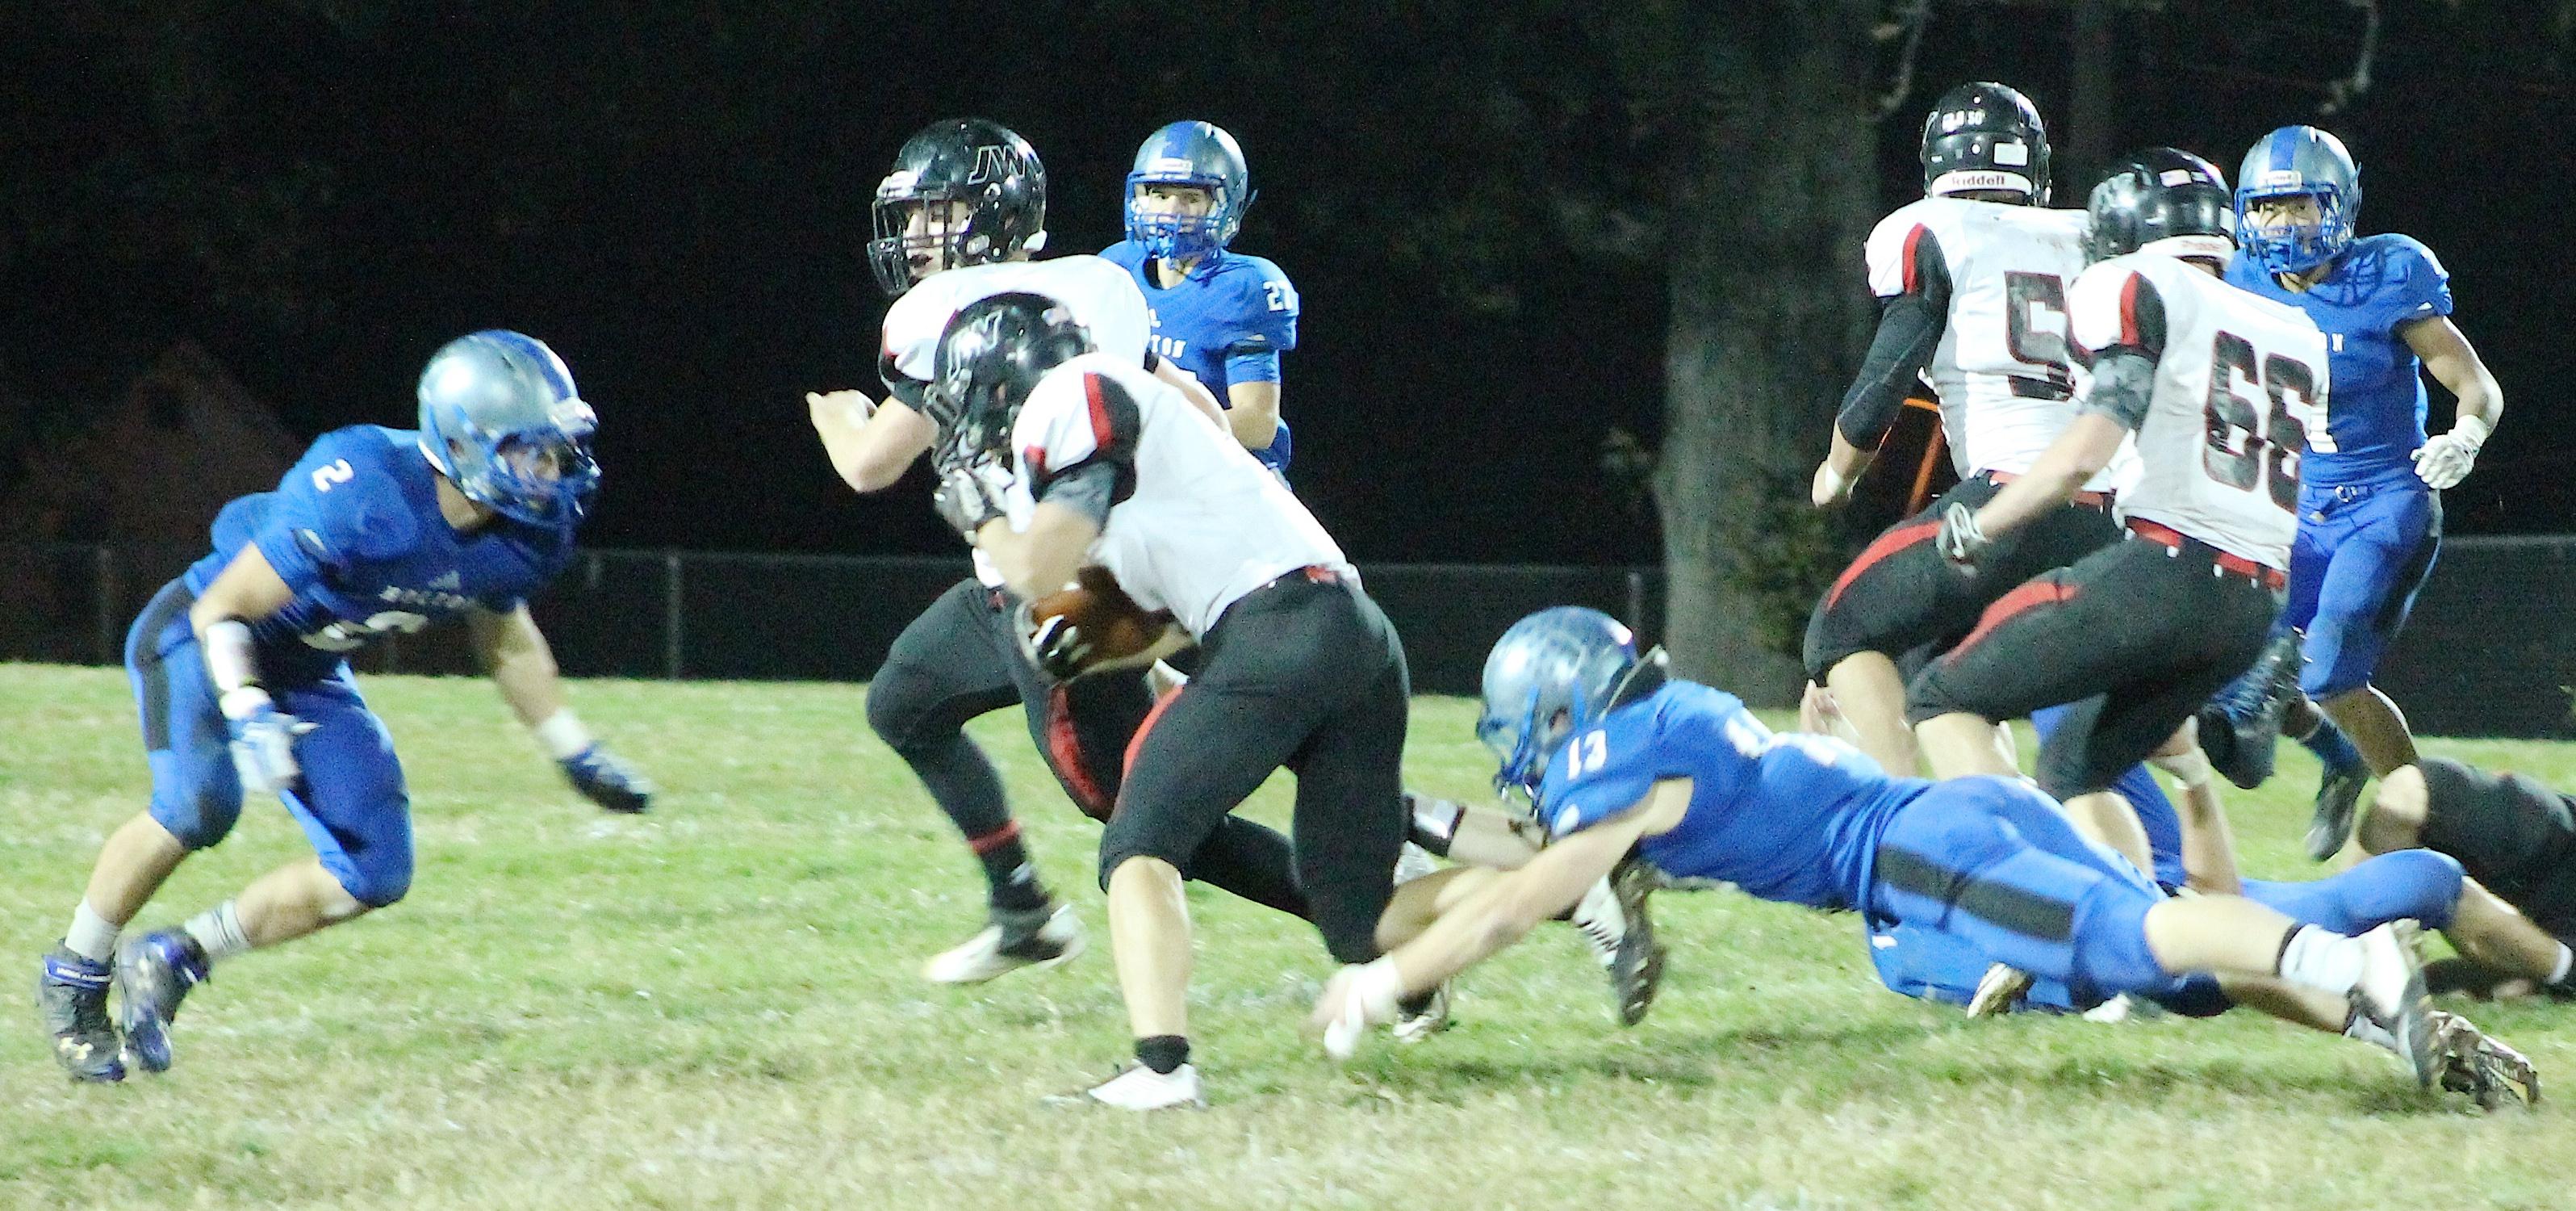 Linebacker Jordan Booth (right) makes a shoestring tackle.